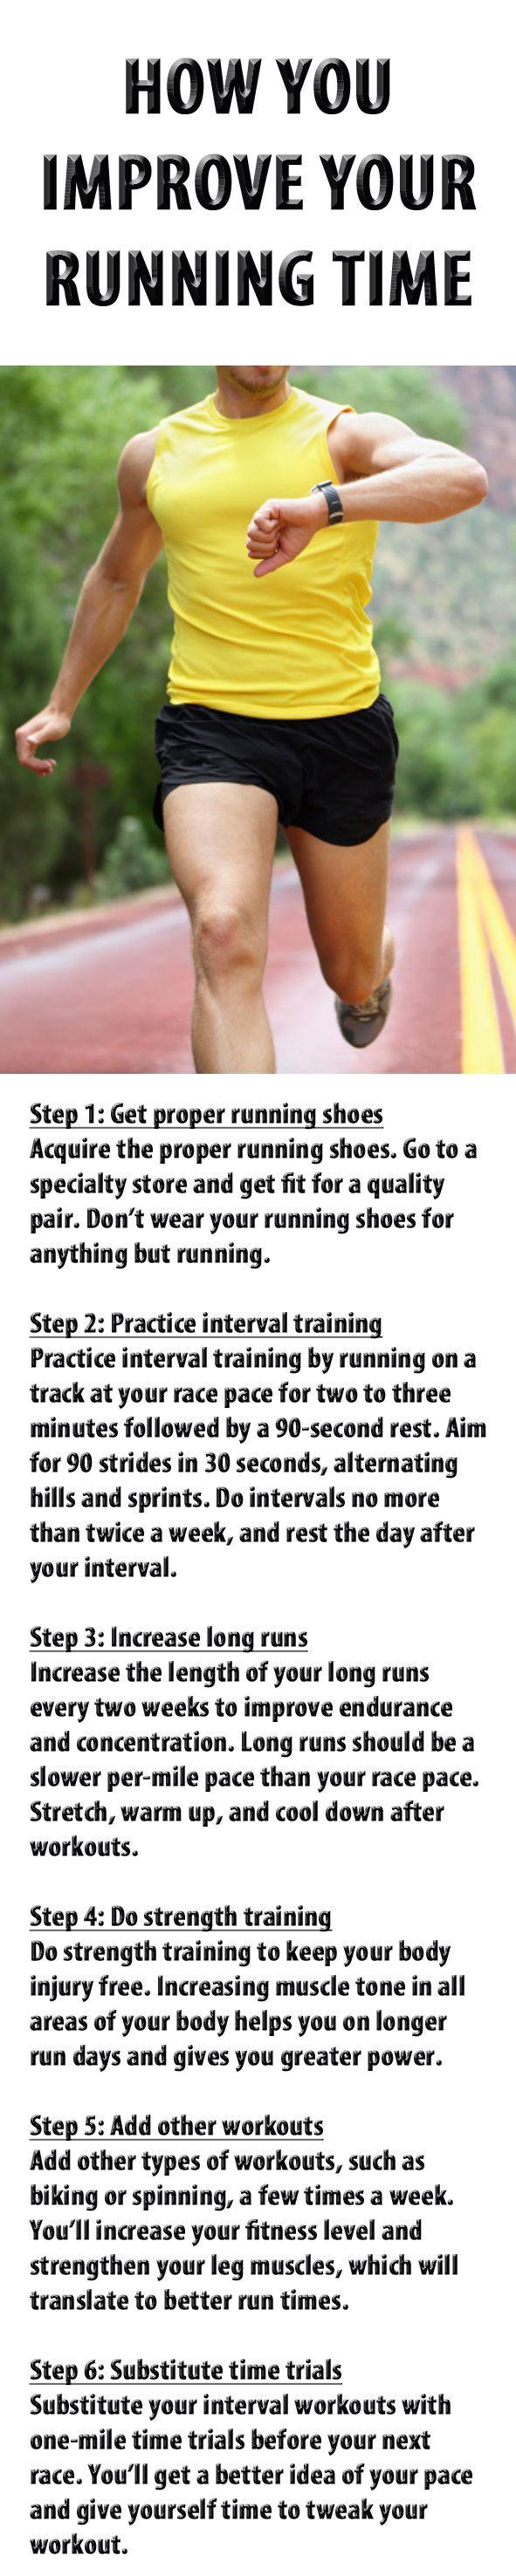 HOW YOU IMPROVE YOUR RUNNING TIME. #running #runningtips #runningadvice